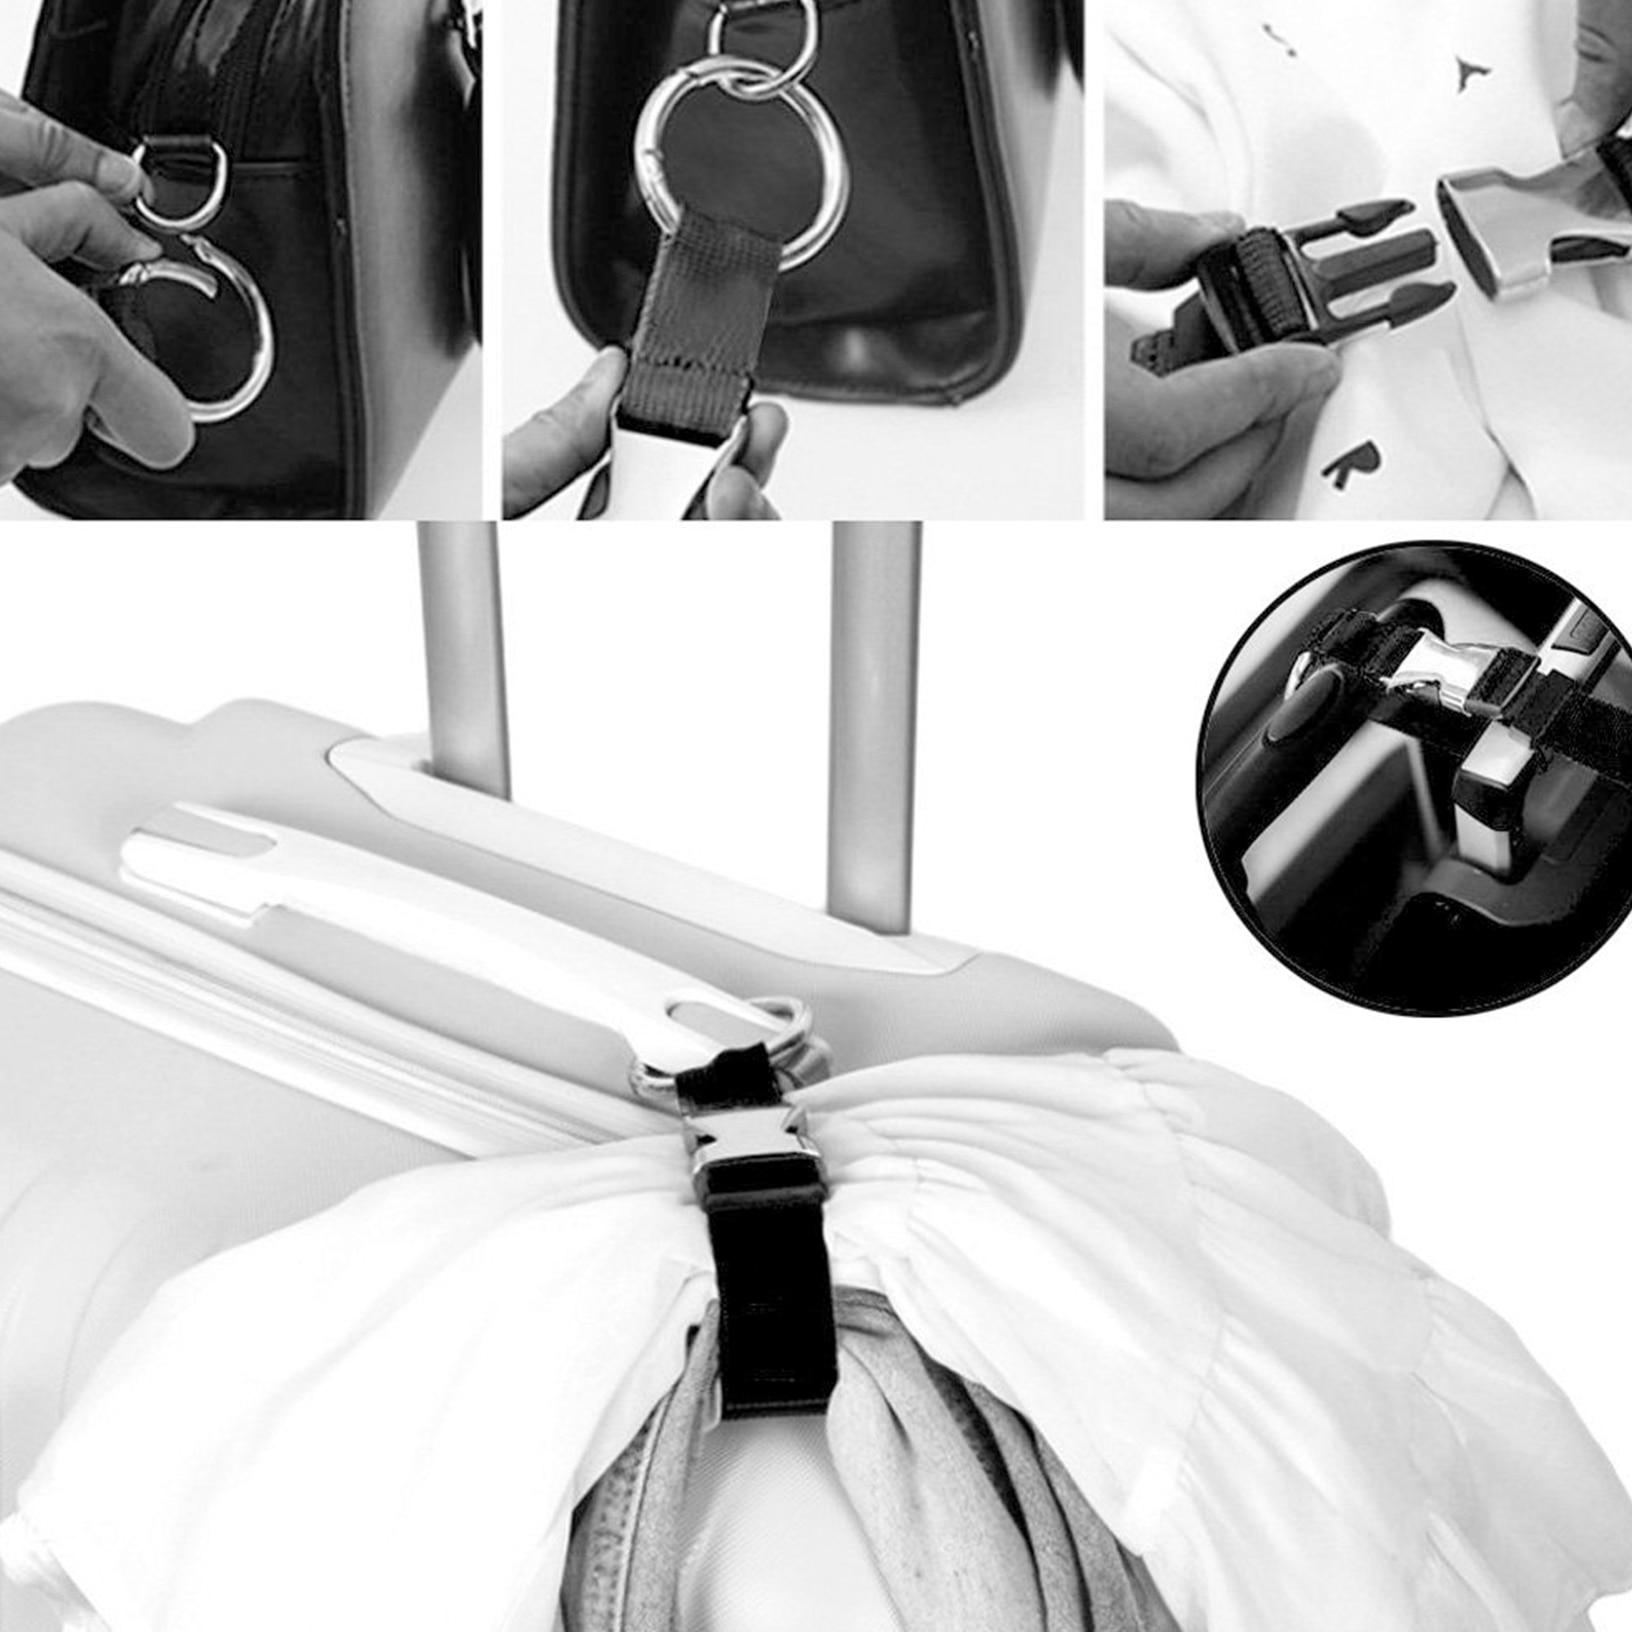 Circuit Board Travel Luggage Strap Adjustable Suitcase Packing Belt